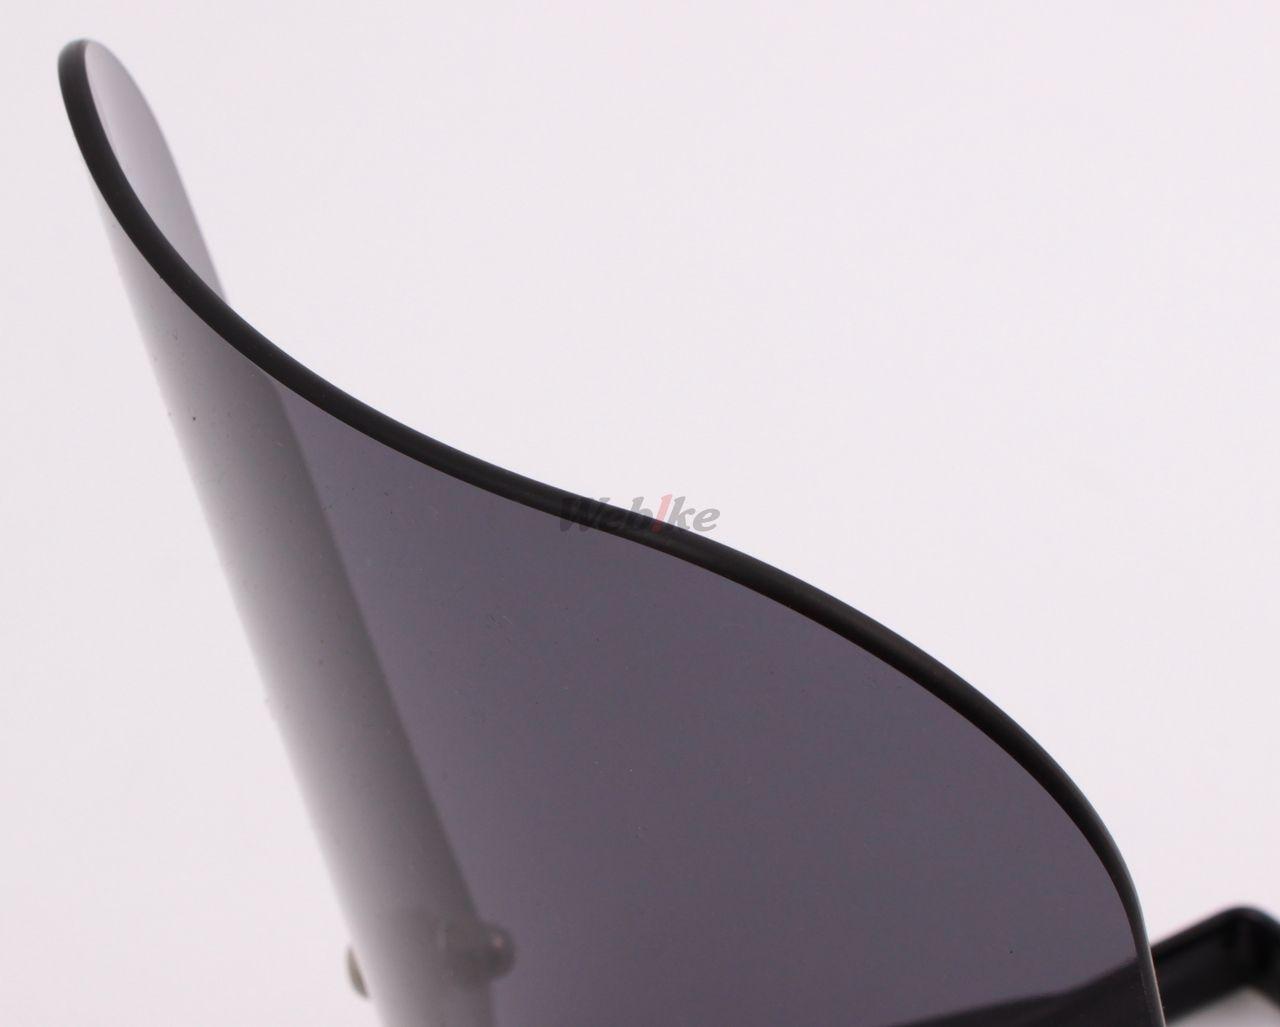 【KIJIMA】儀錶風鏡 - 「Webike-摩托百貨」